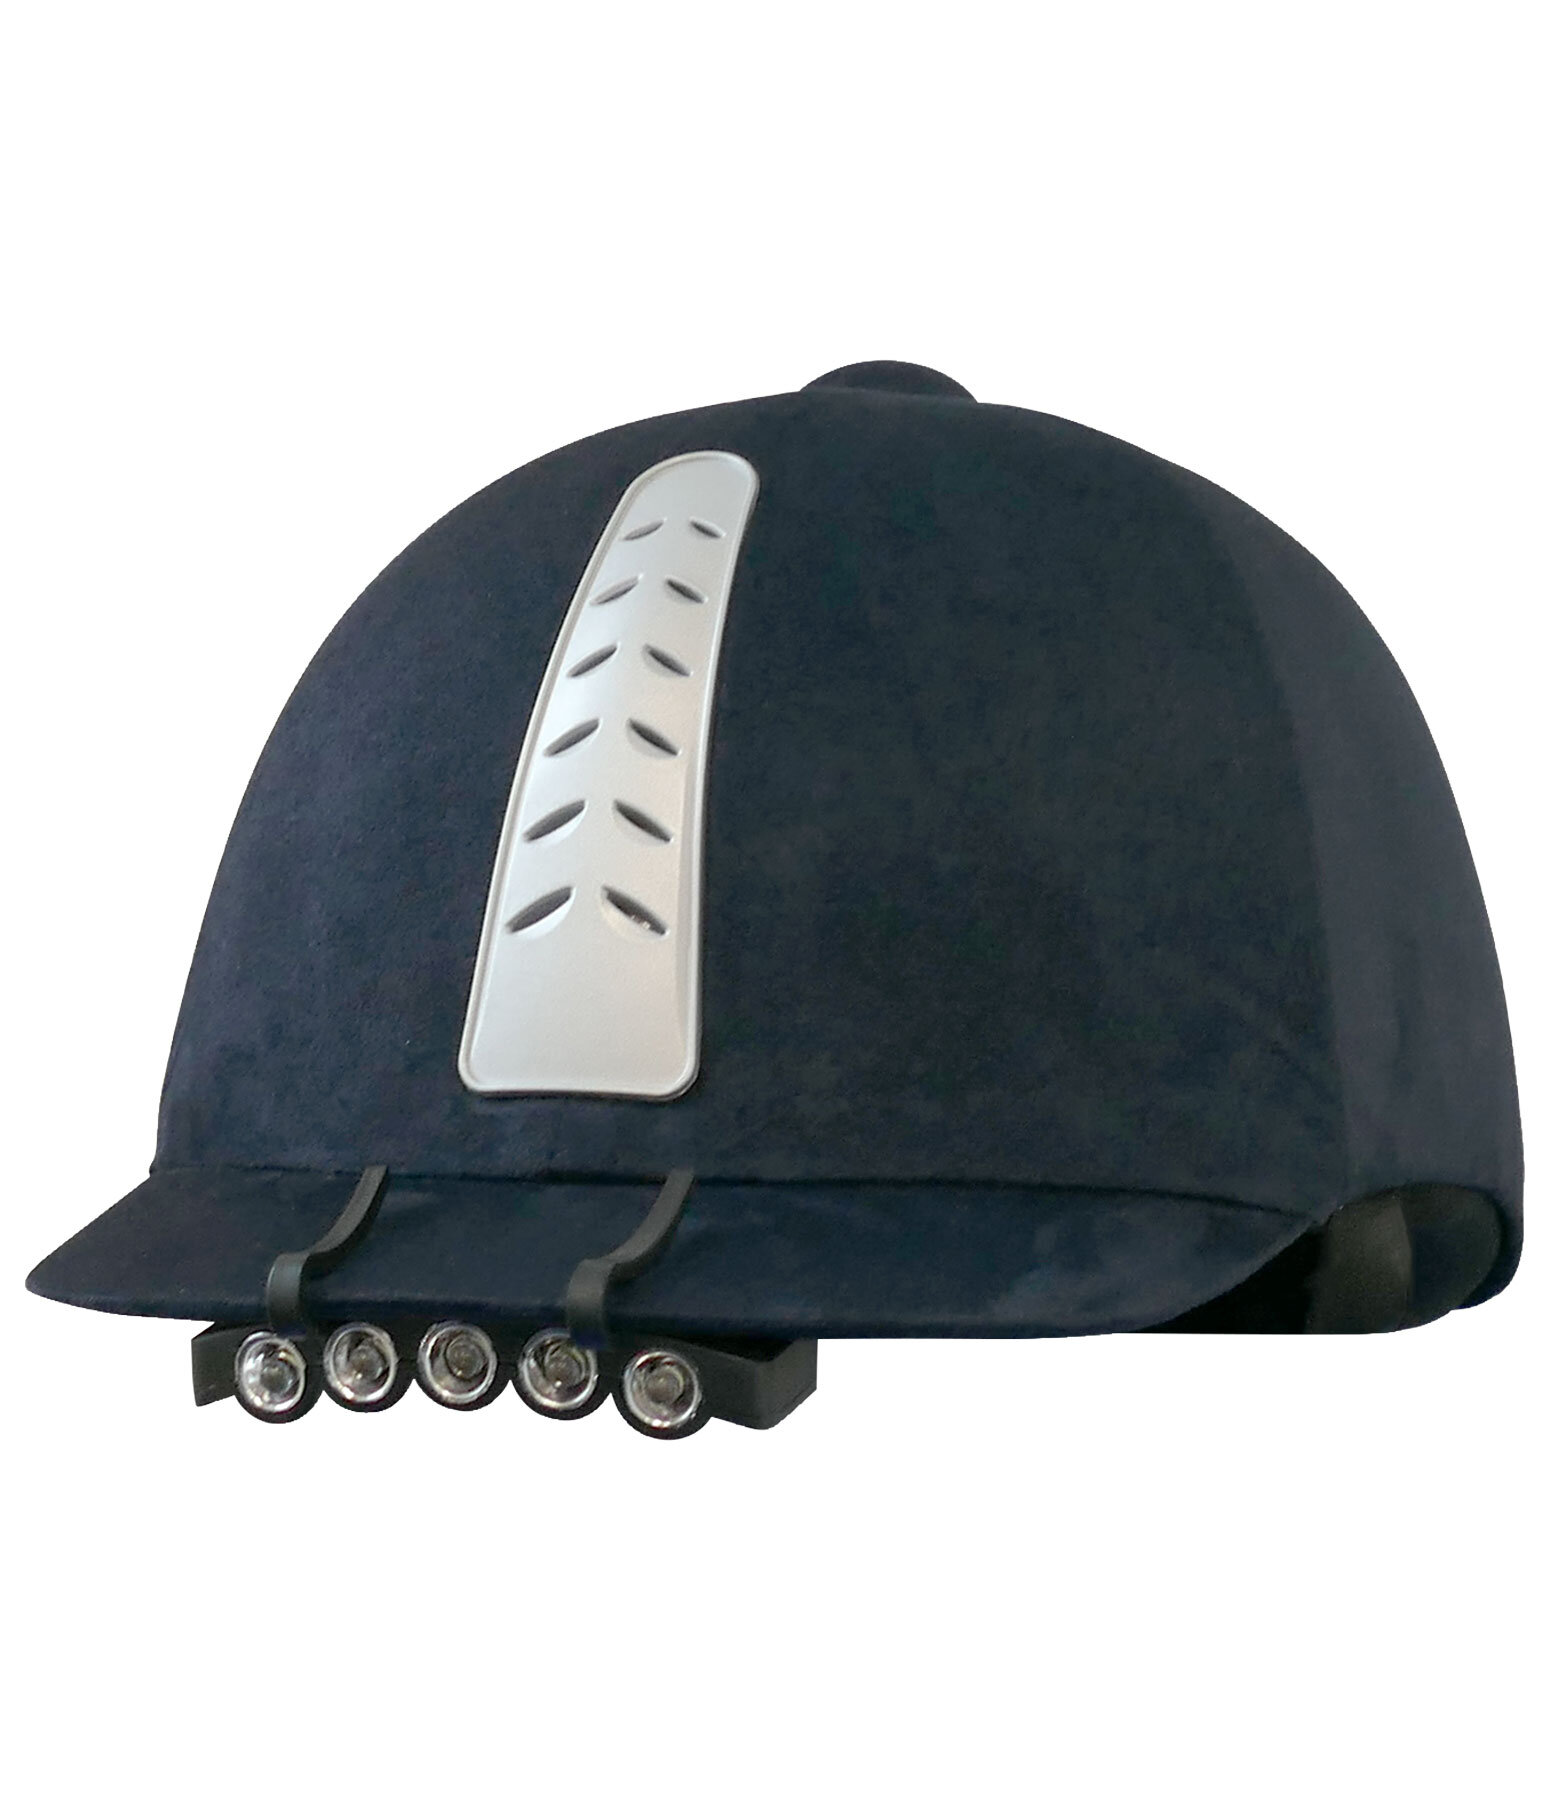 lampe clipser avec 6 led accessoires pour casques kramer equitation. Black Bedroom Furniture Sets. Home Design Ideas